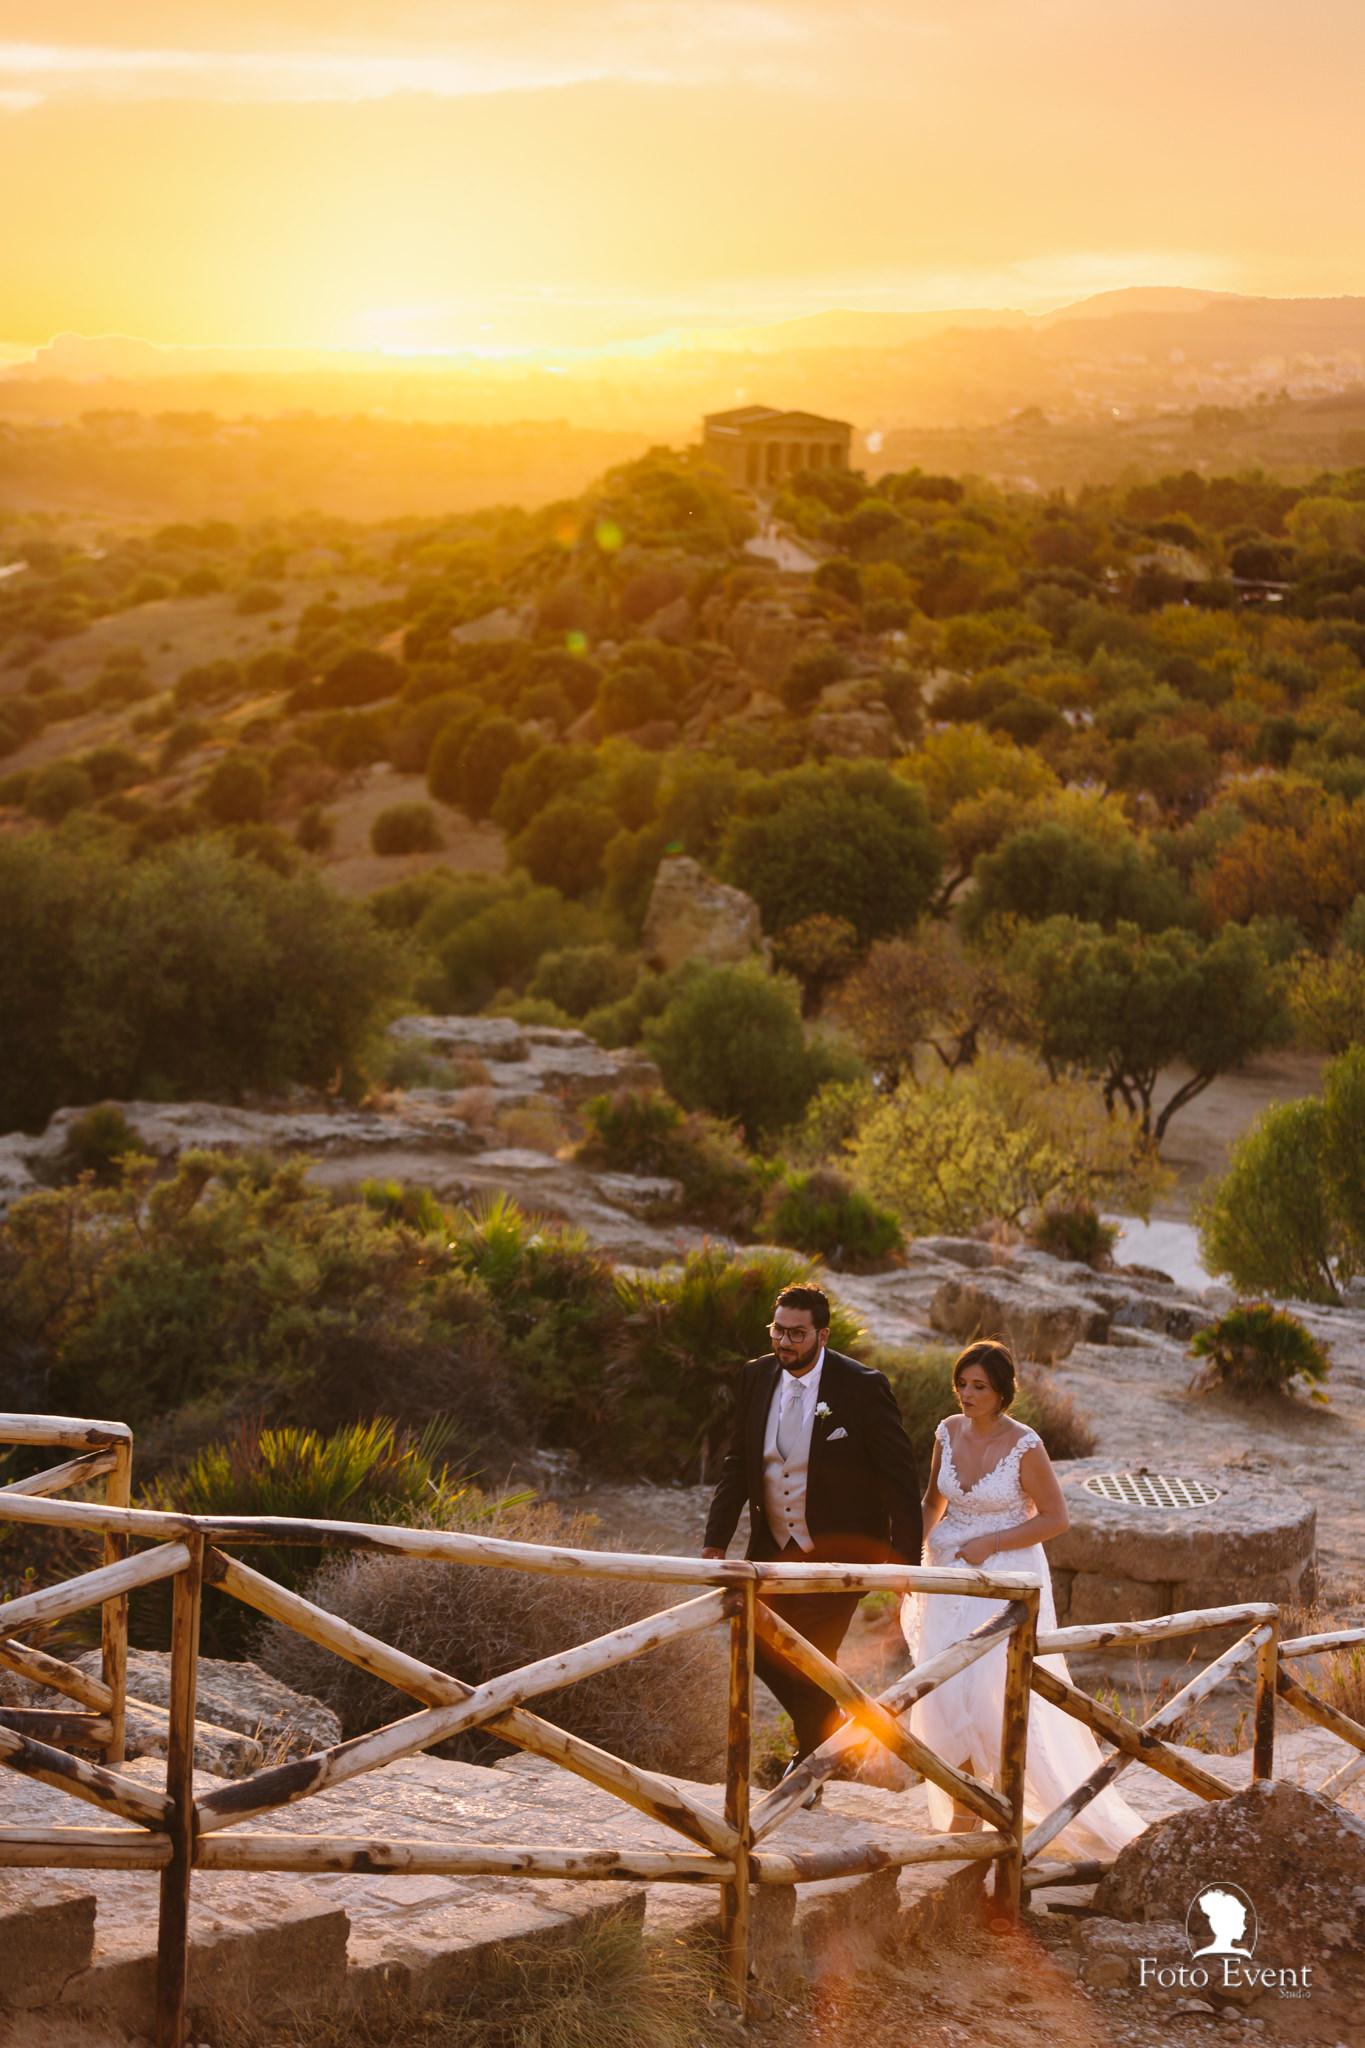 034-2019-09-09-Matrimonio-Dorotea-e-Alberto-Iemmolo-zoom-567